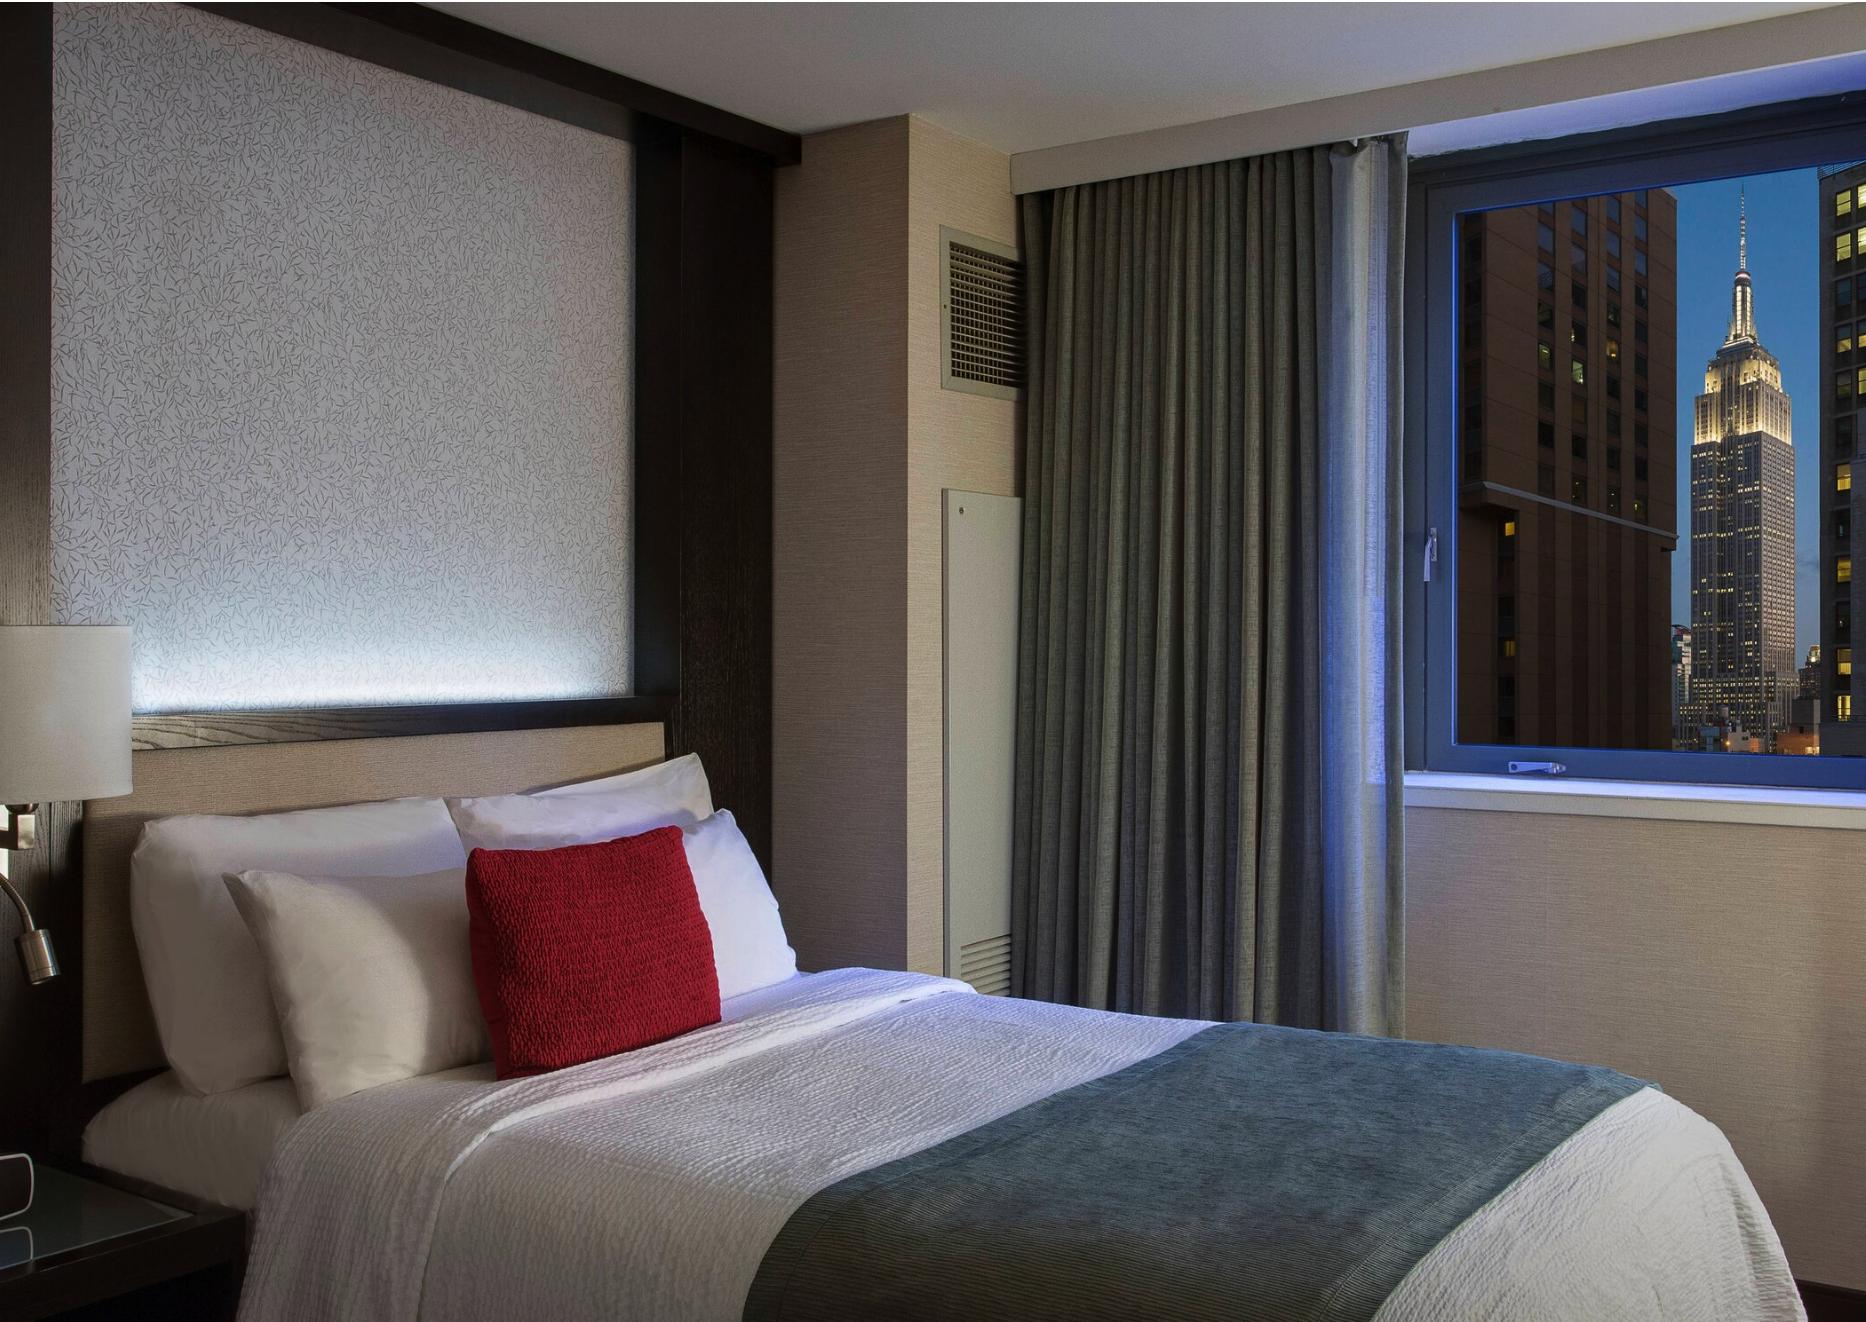 https://www.hotelsbyday.com/_data/default-hotel_image/2/12726/screenshot-2019-06-28-at-15-01-07.png